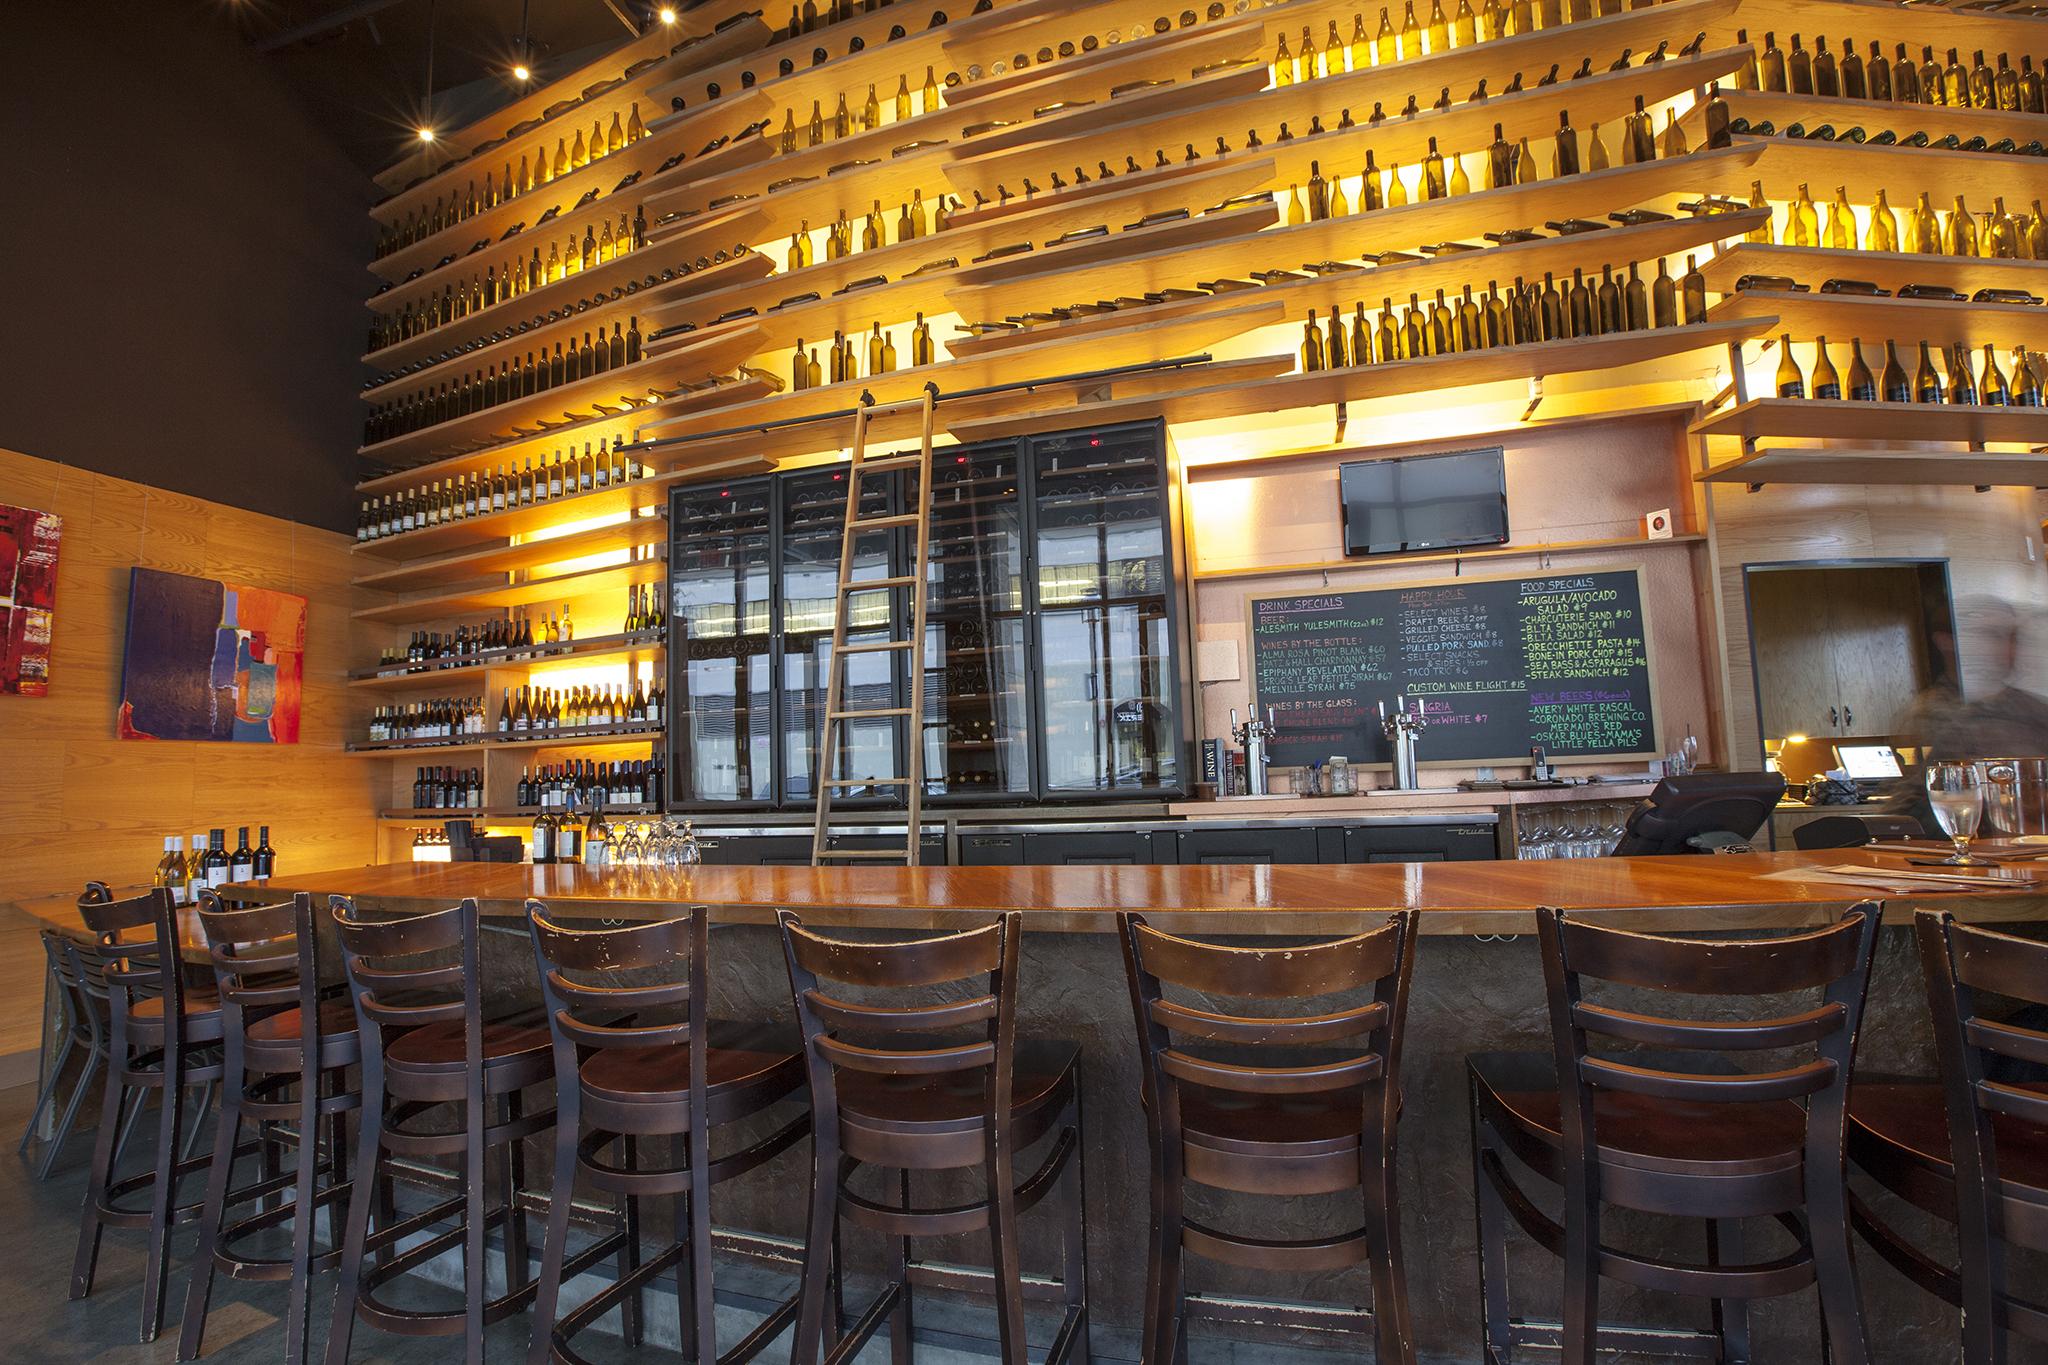 Los Angeles Bars, Reviews & Bar Events